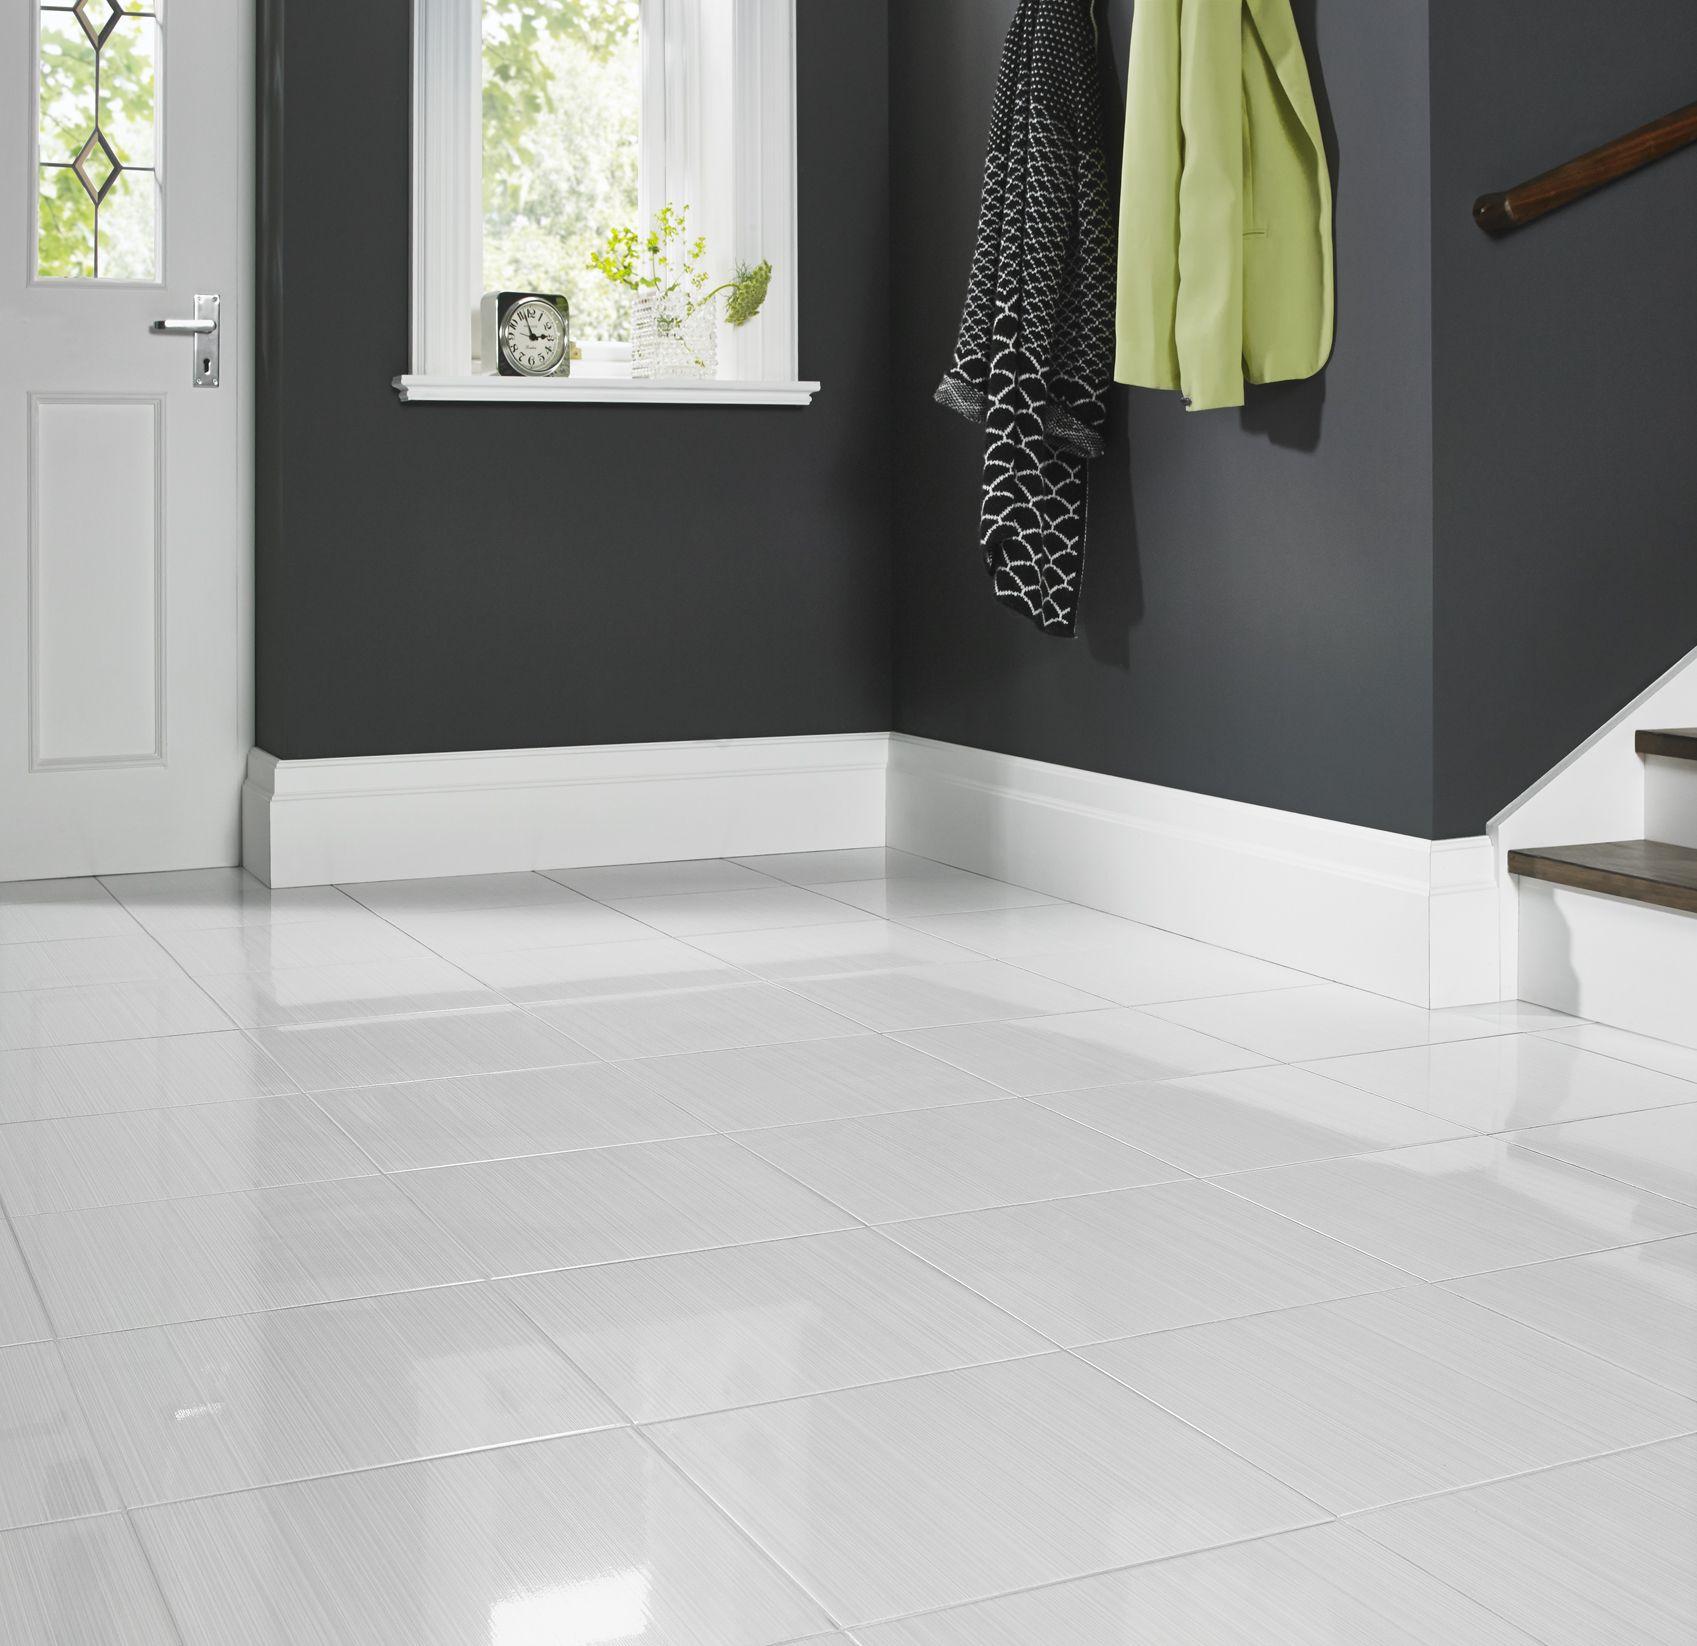 Blairlock White Floor Tile set in Entryway | Blairlock White ...